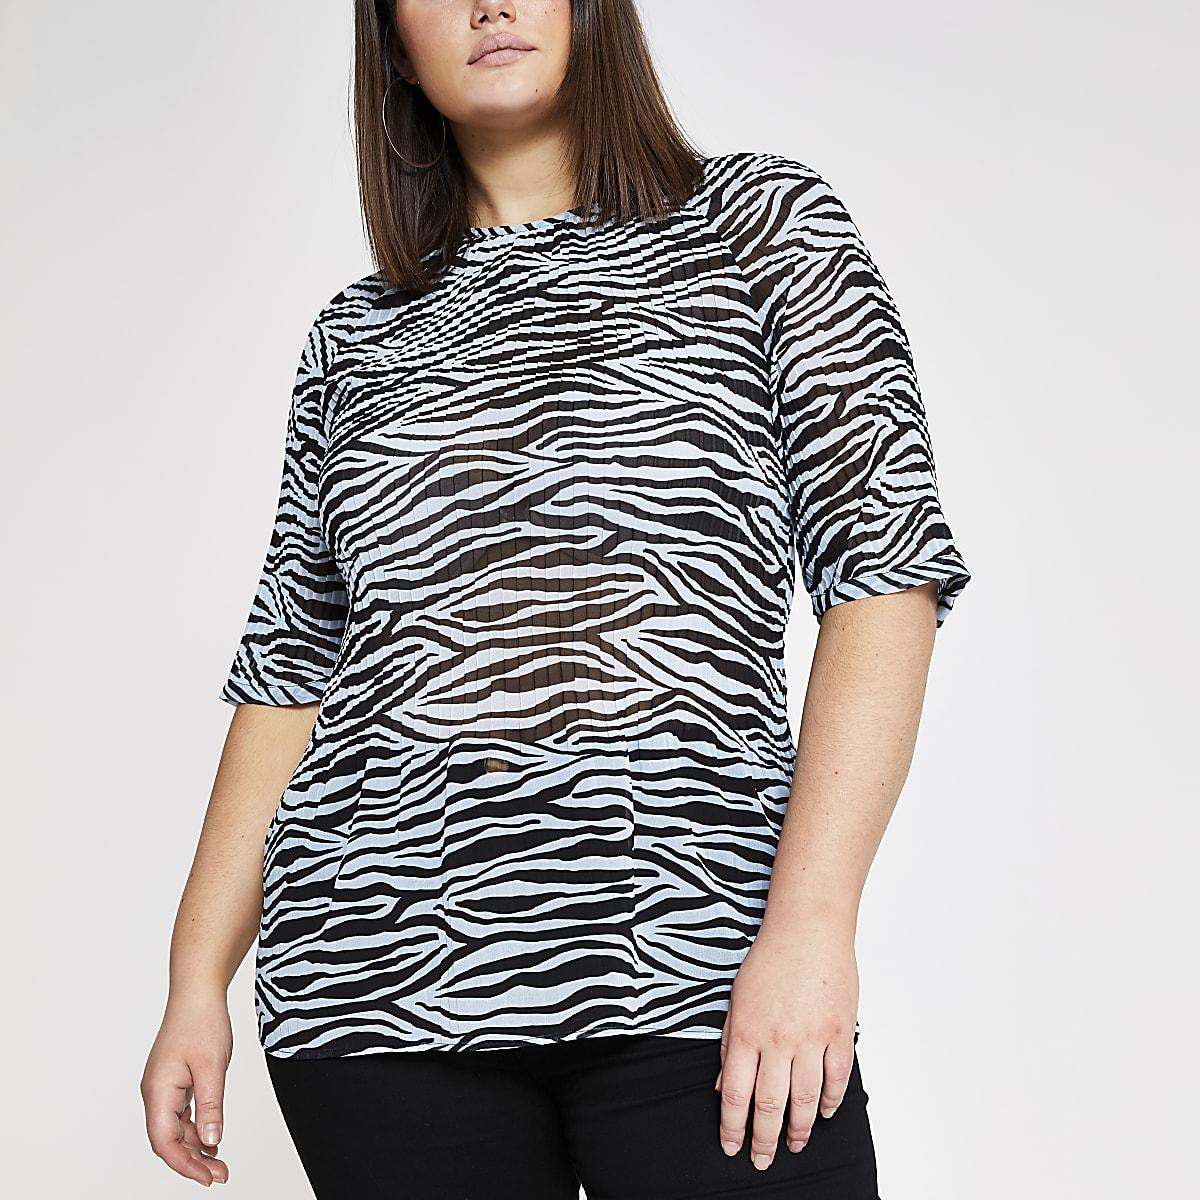 RI Plus - Blauwe plissé top met zebraprint